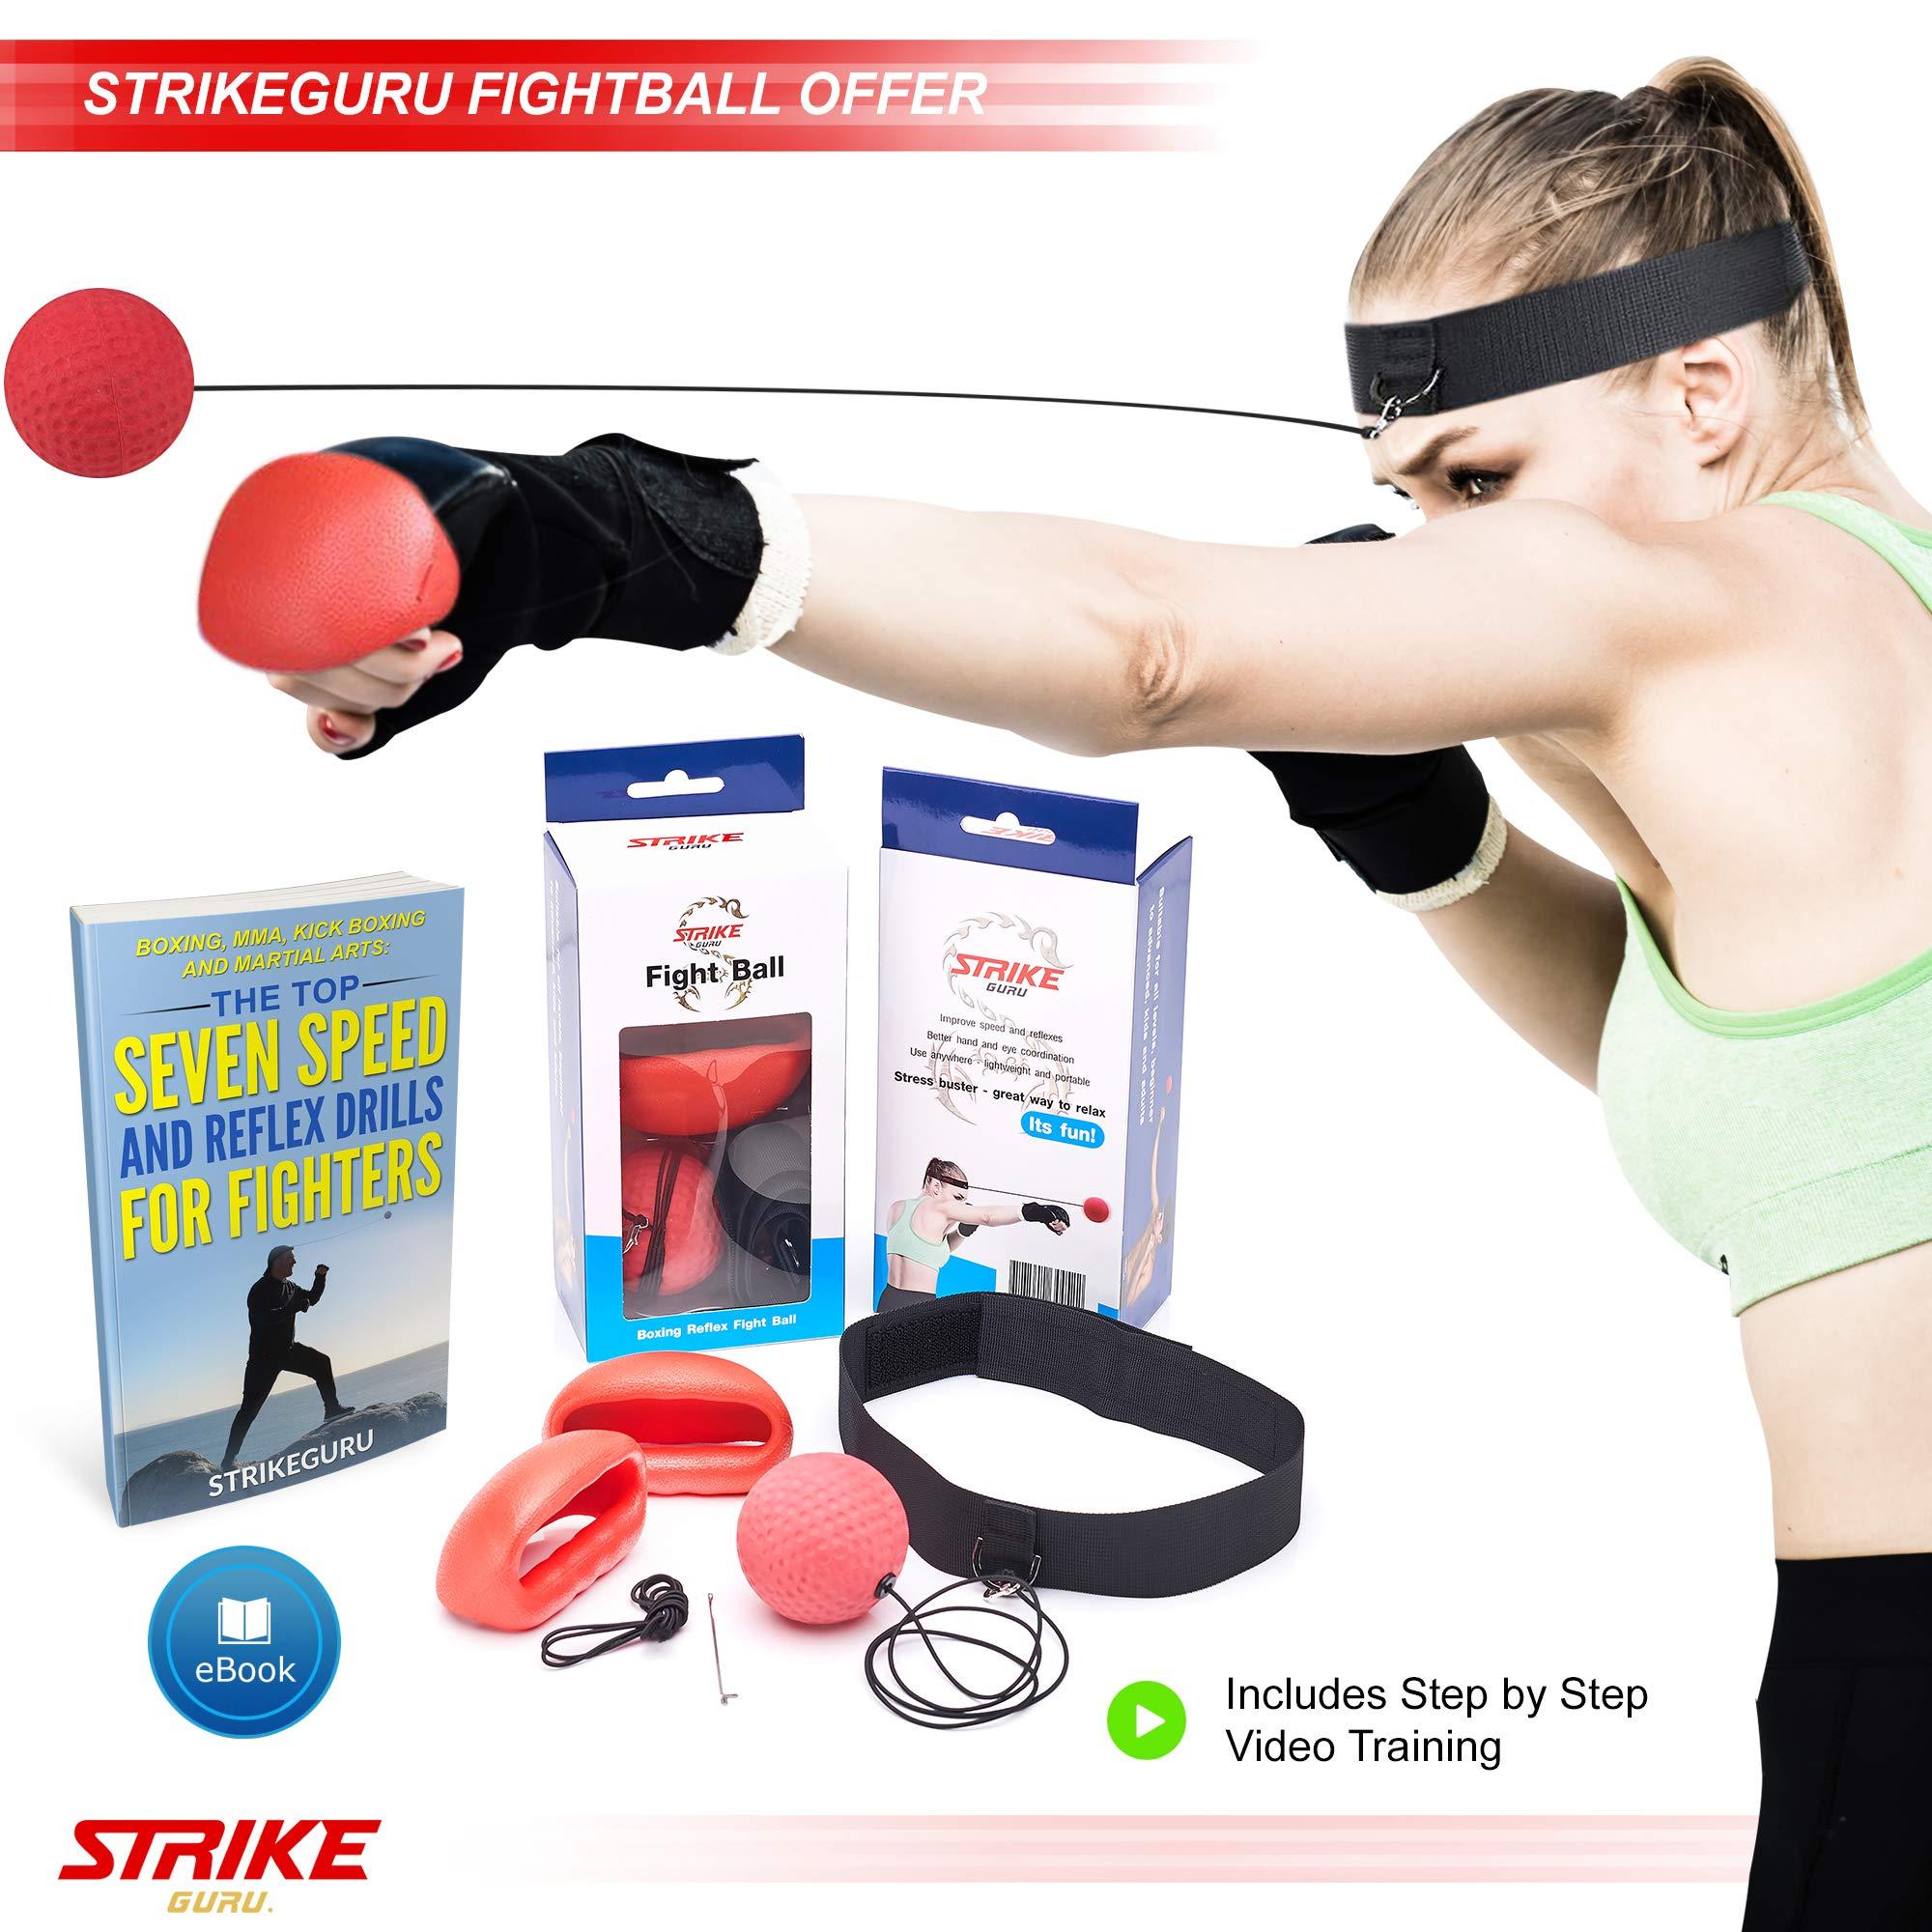 StrikeGuru Boxing Reflex Fight Ball, BONUS E-book, BONUS Step step Online VDO Training, Perfect Reaction, Agility, Punching Speed, Fight Skill Hand Eye Coordination Training by StrikeGuru